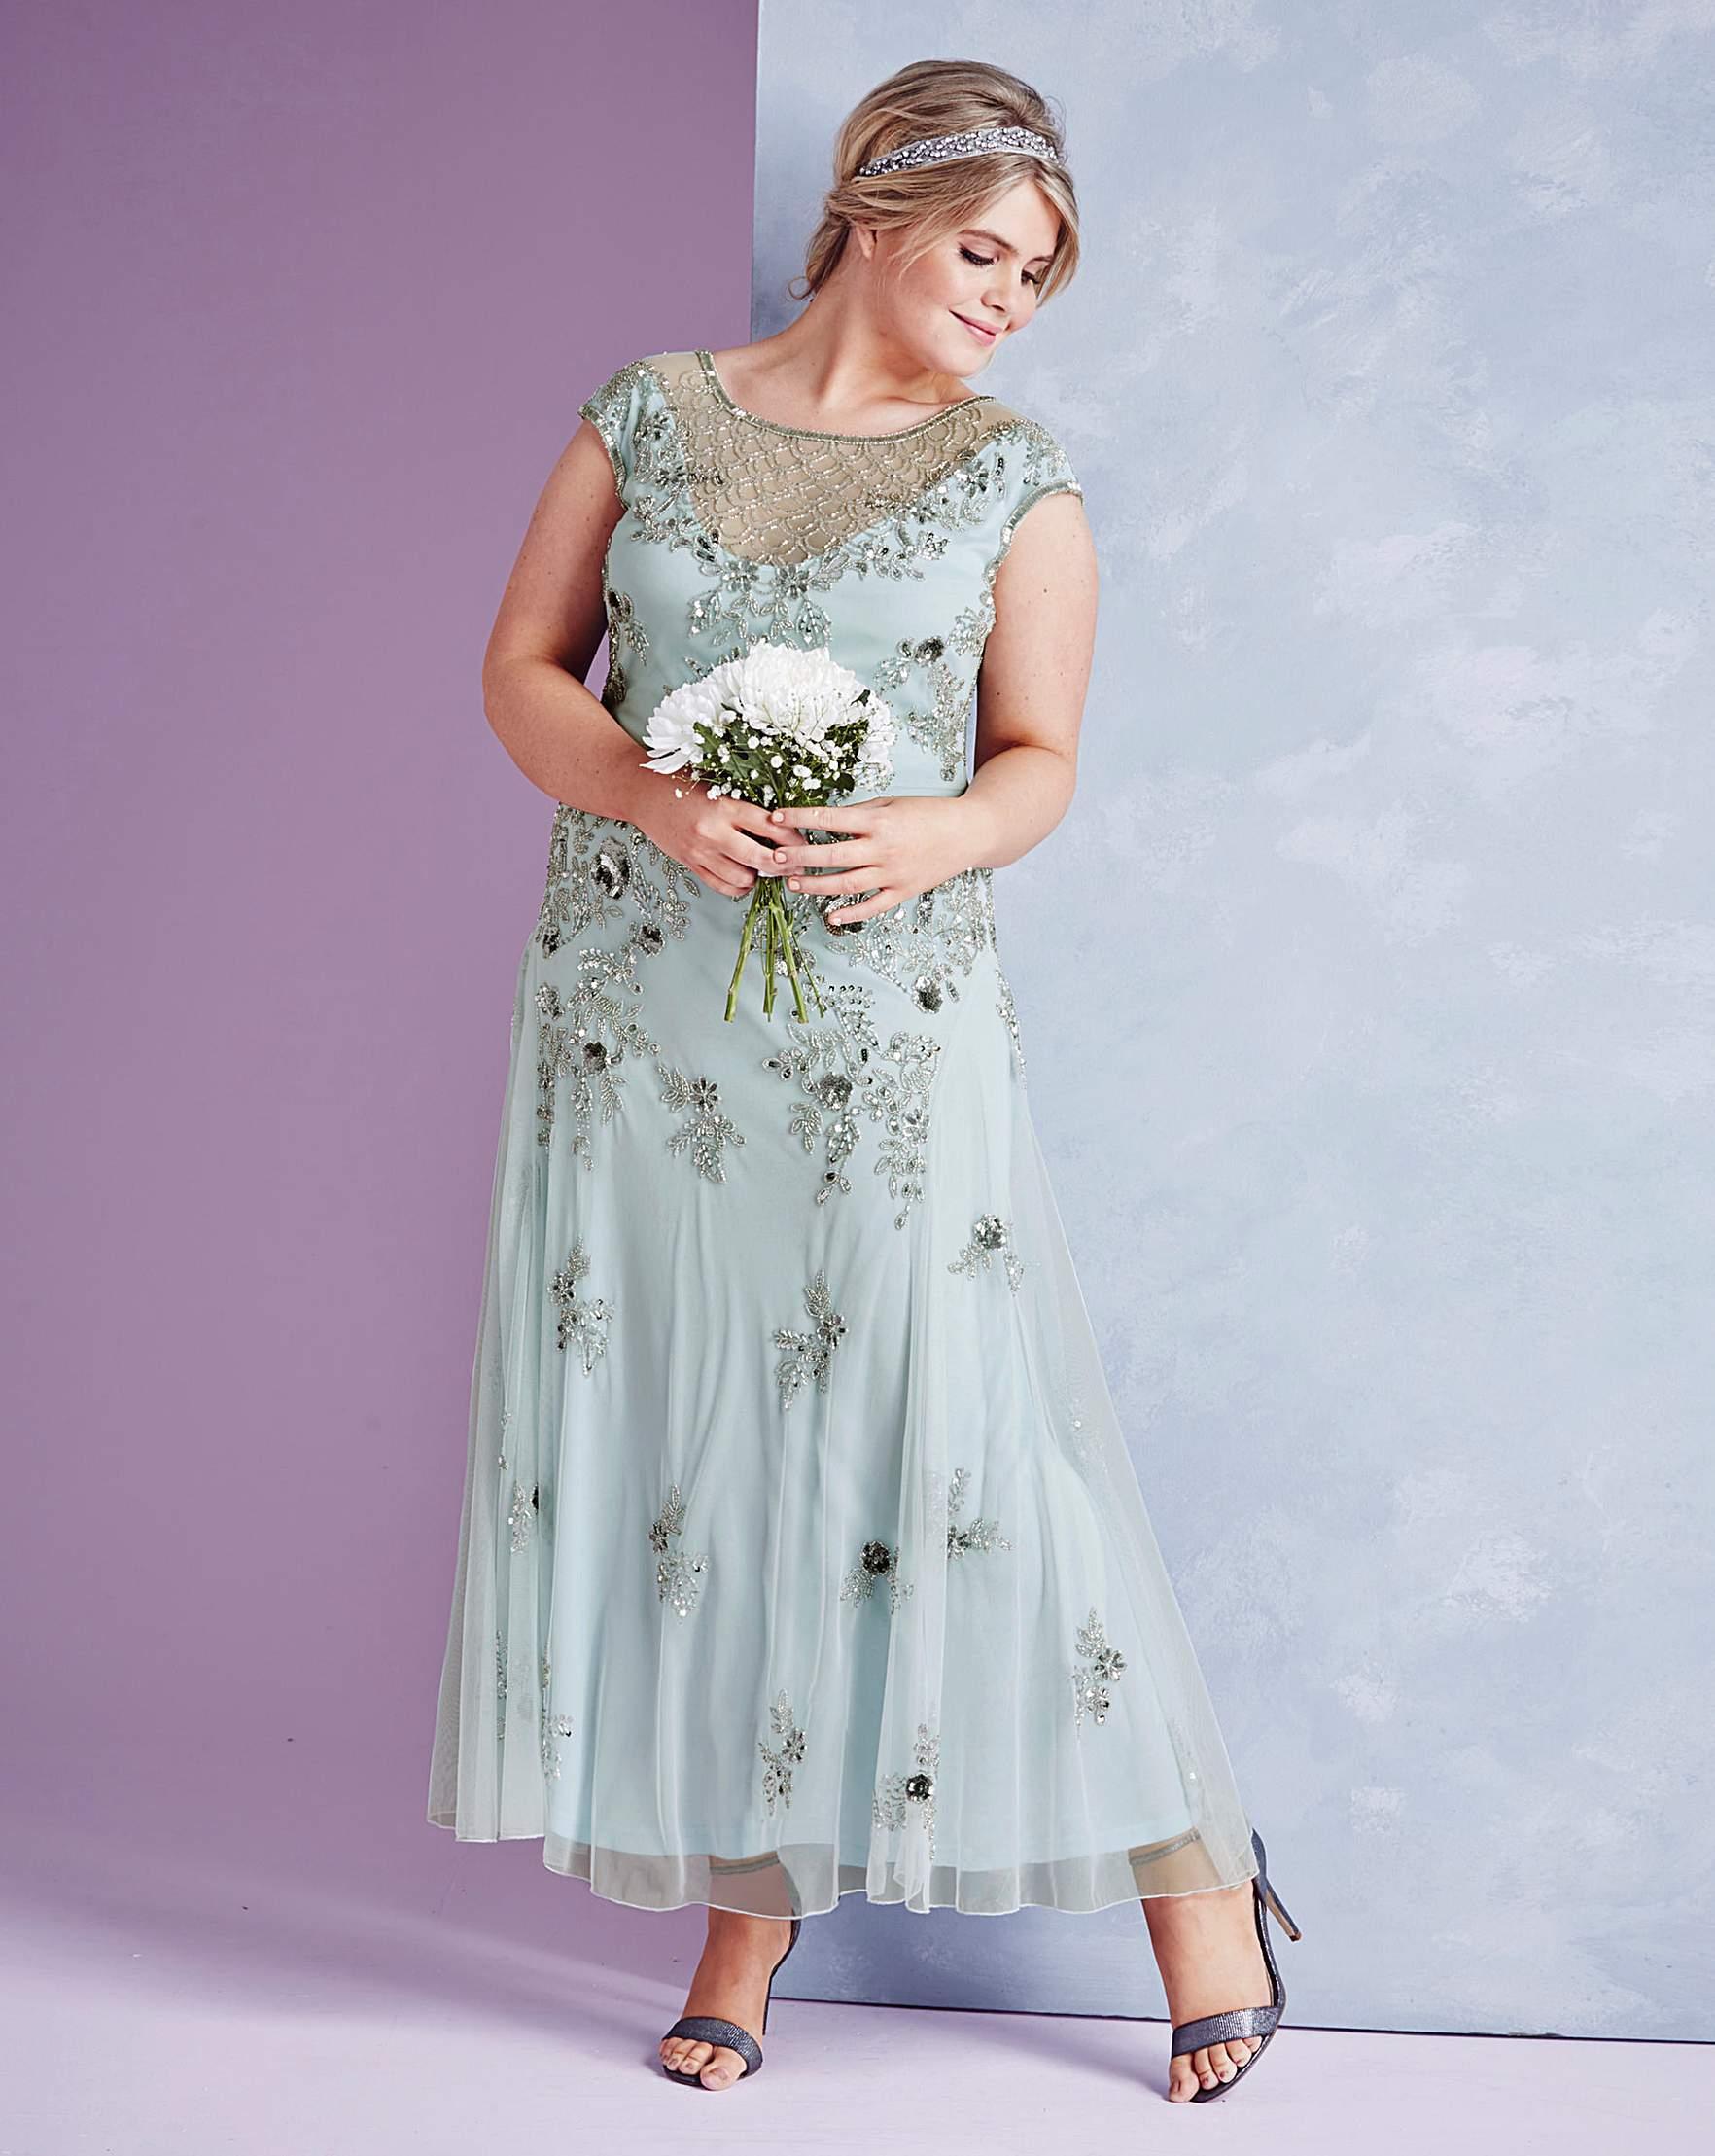 JOANNA HOPE Embellished Maxi Dress | Simply Be